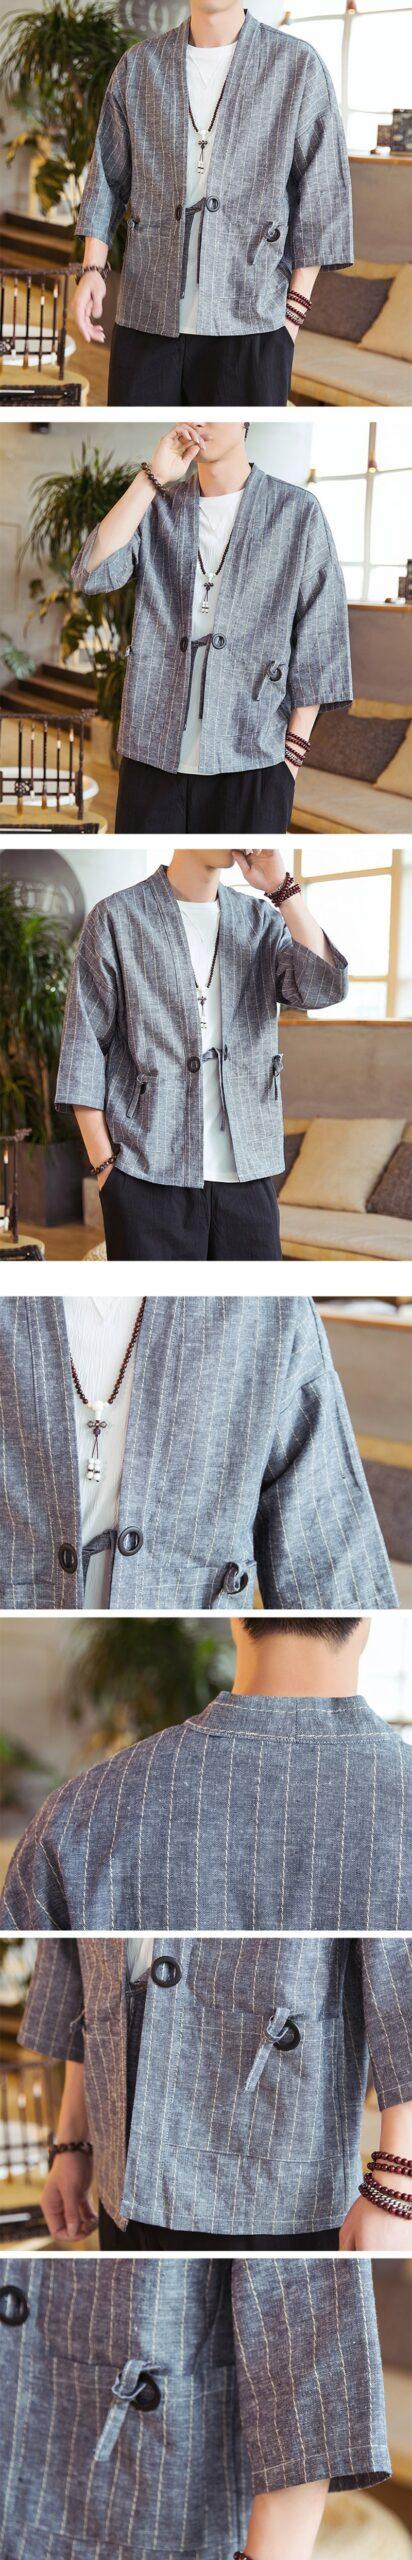 Light Gray Striped Noragi 4